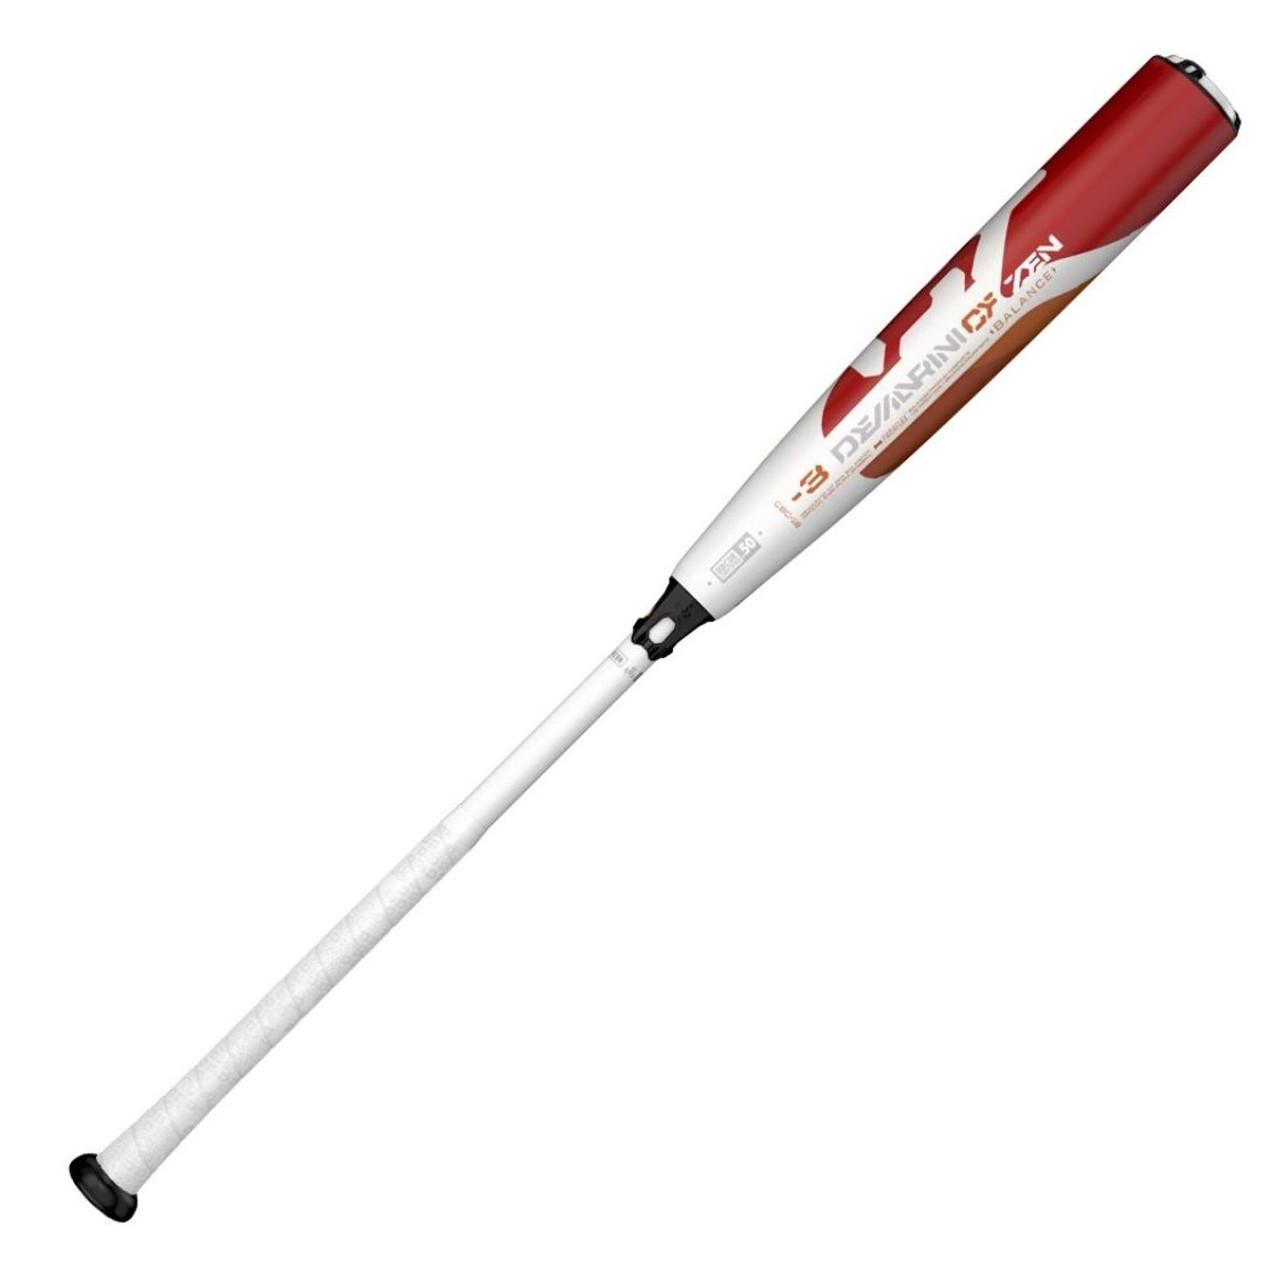 2018 DeMarini CF Zen BBCOR Balanced Baseball Bat (-3) - Legends Athletic  Supply ce2770a1c7